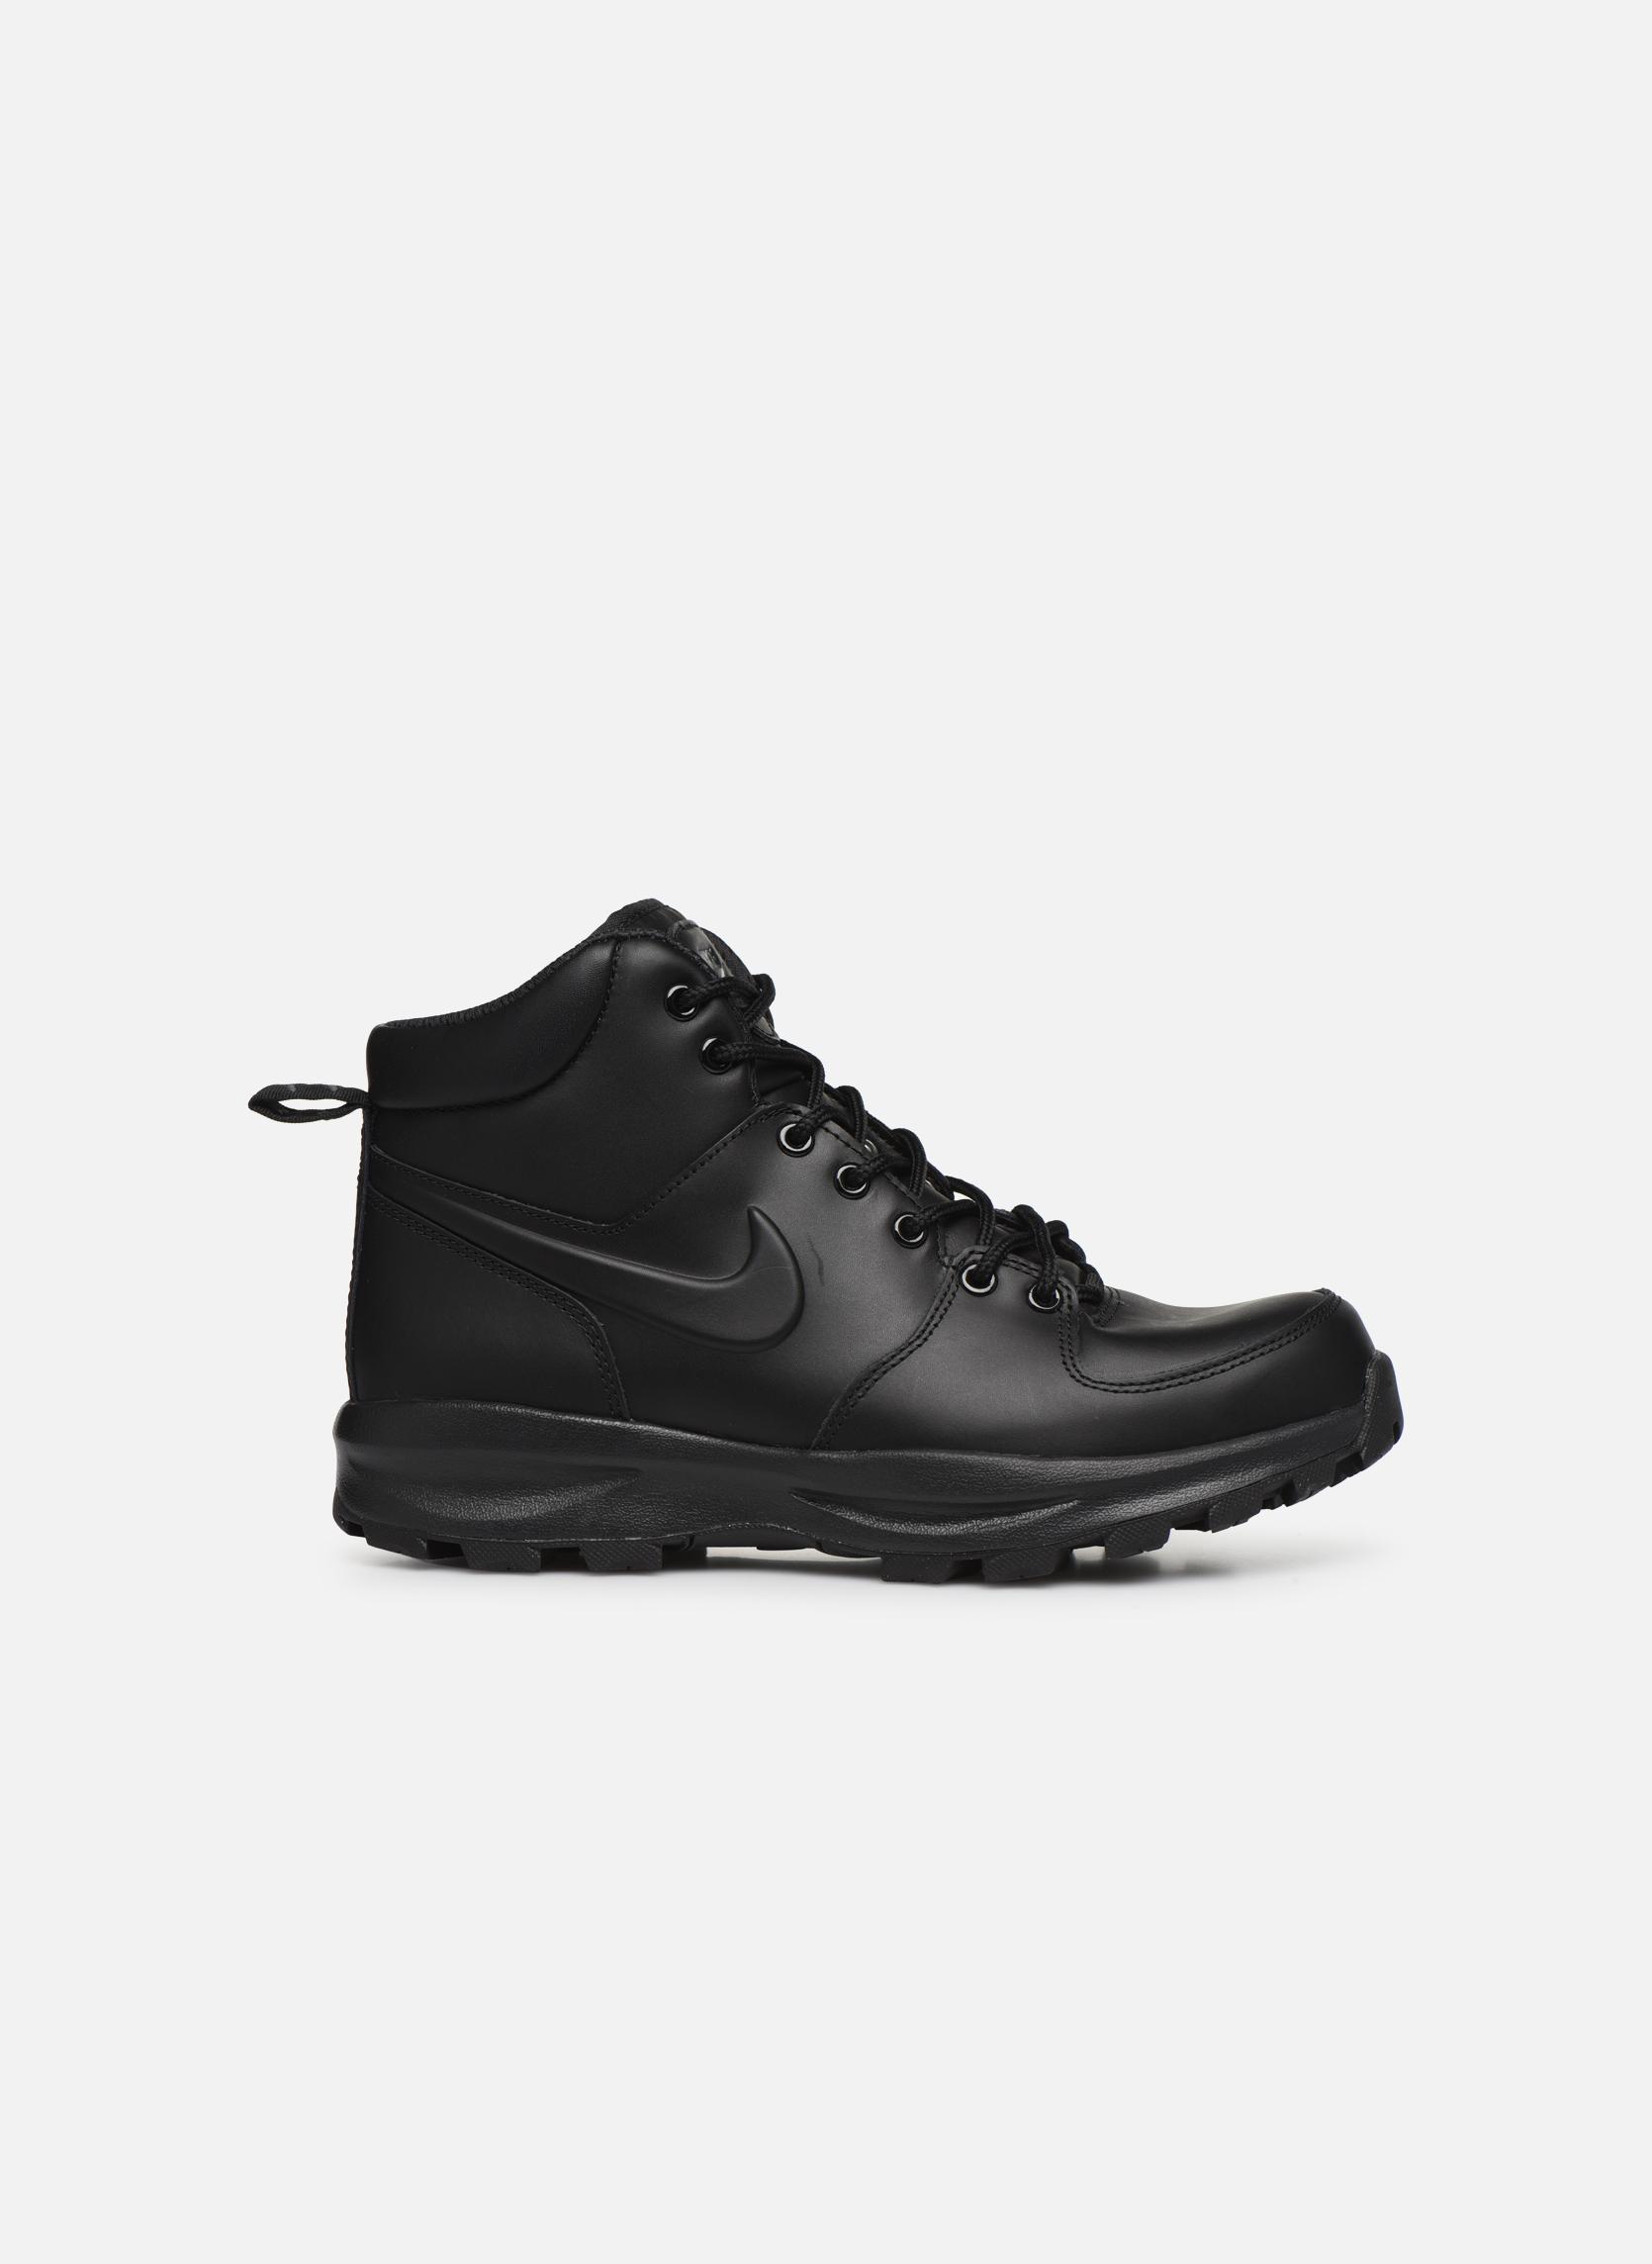 Manoa leather Black/black